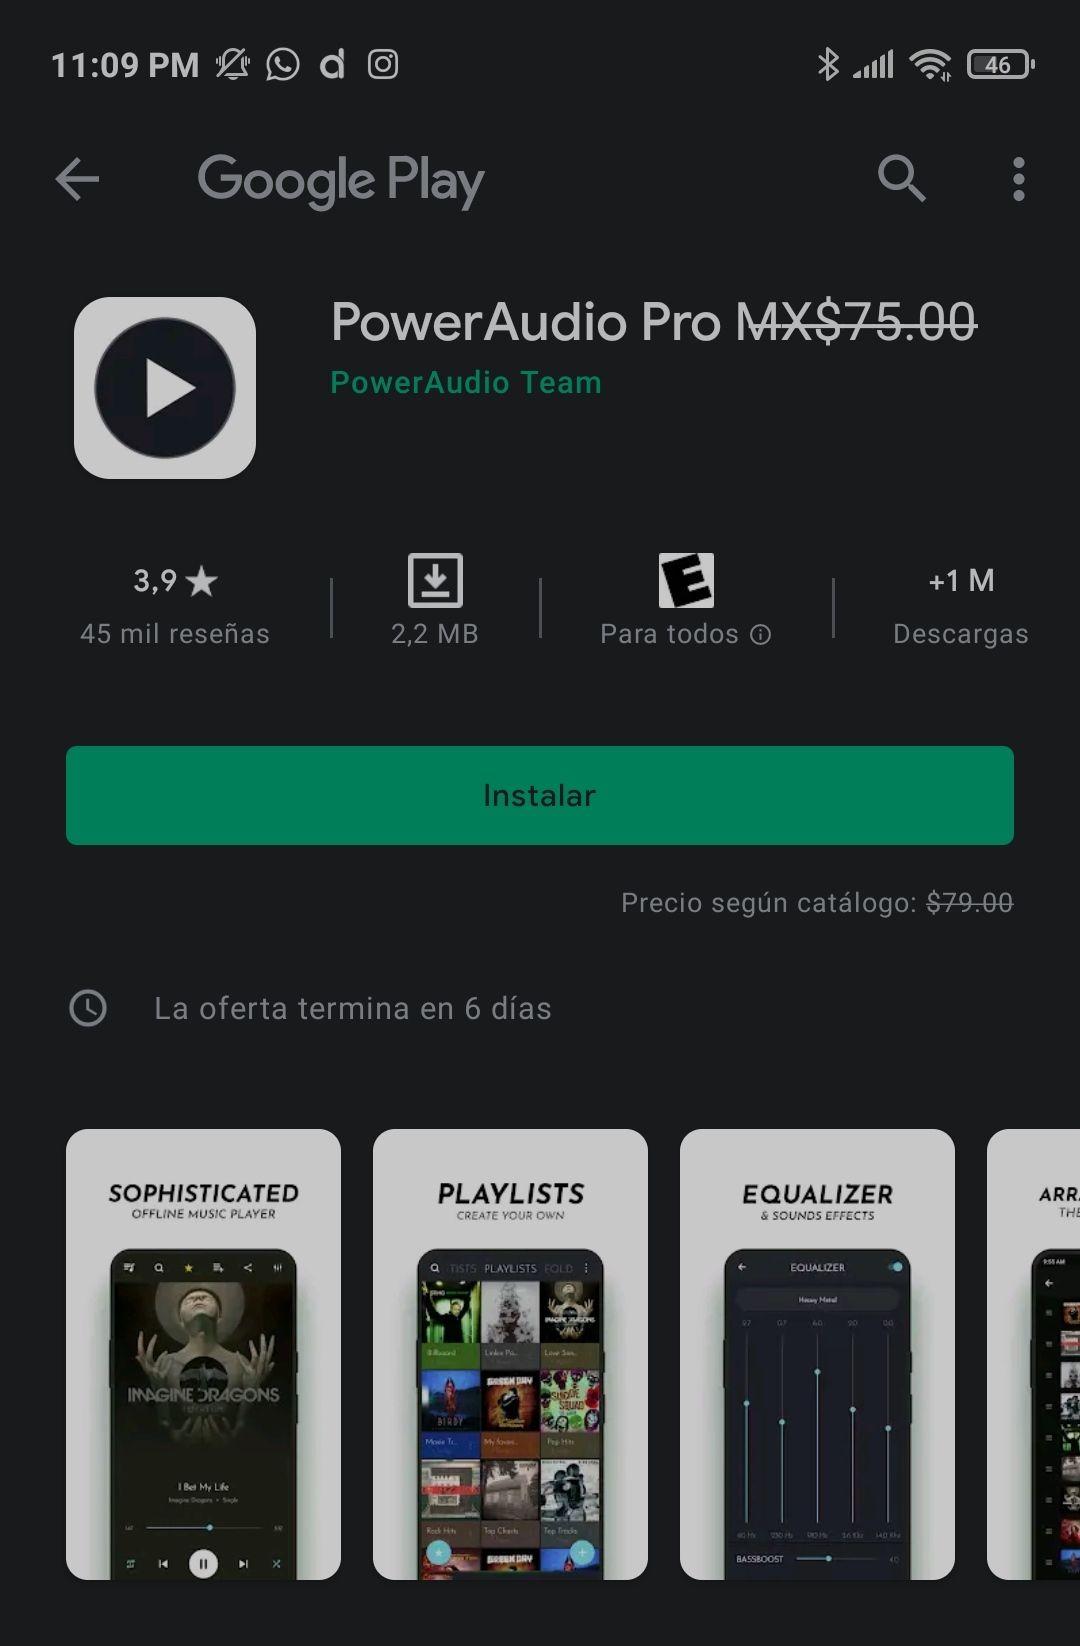 Google Play: Power audio pro